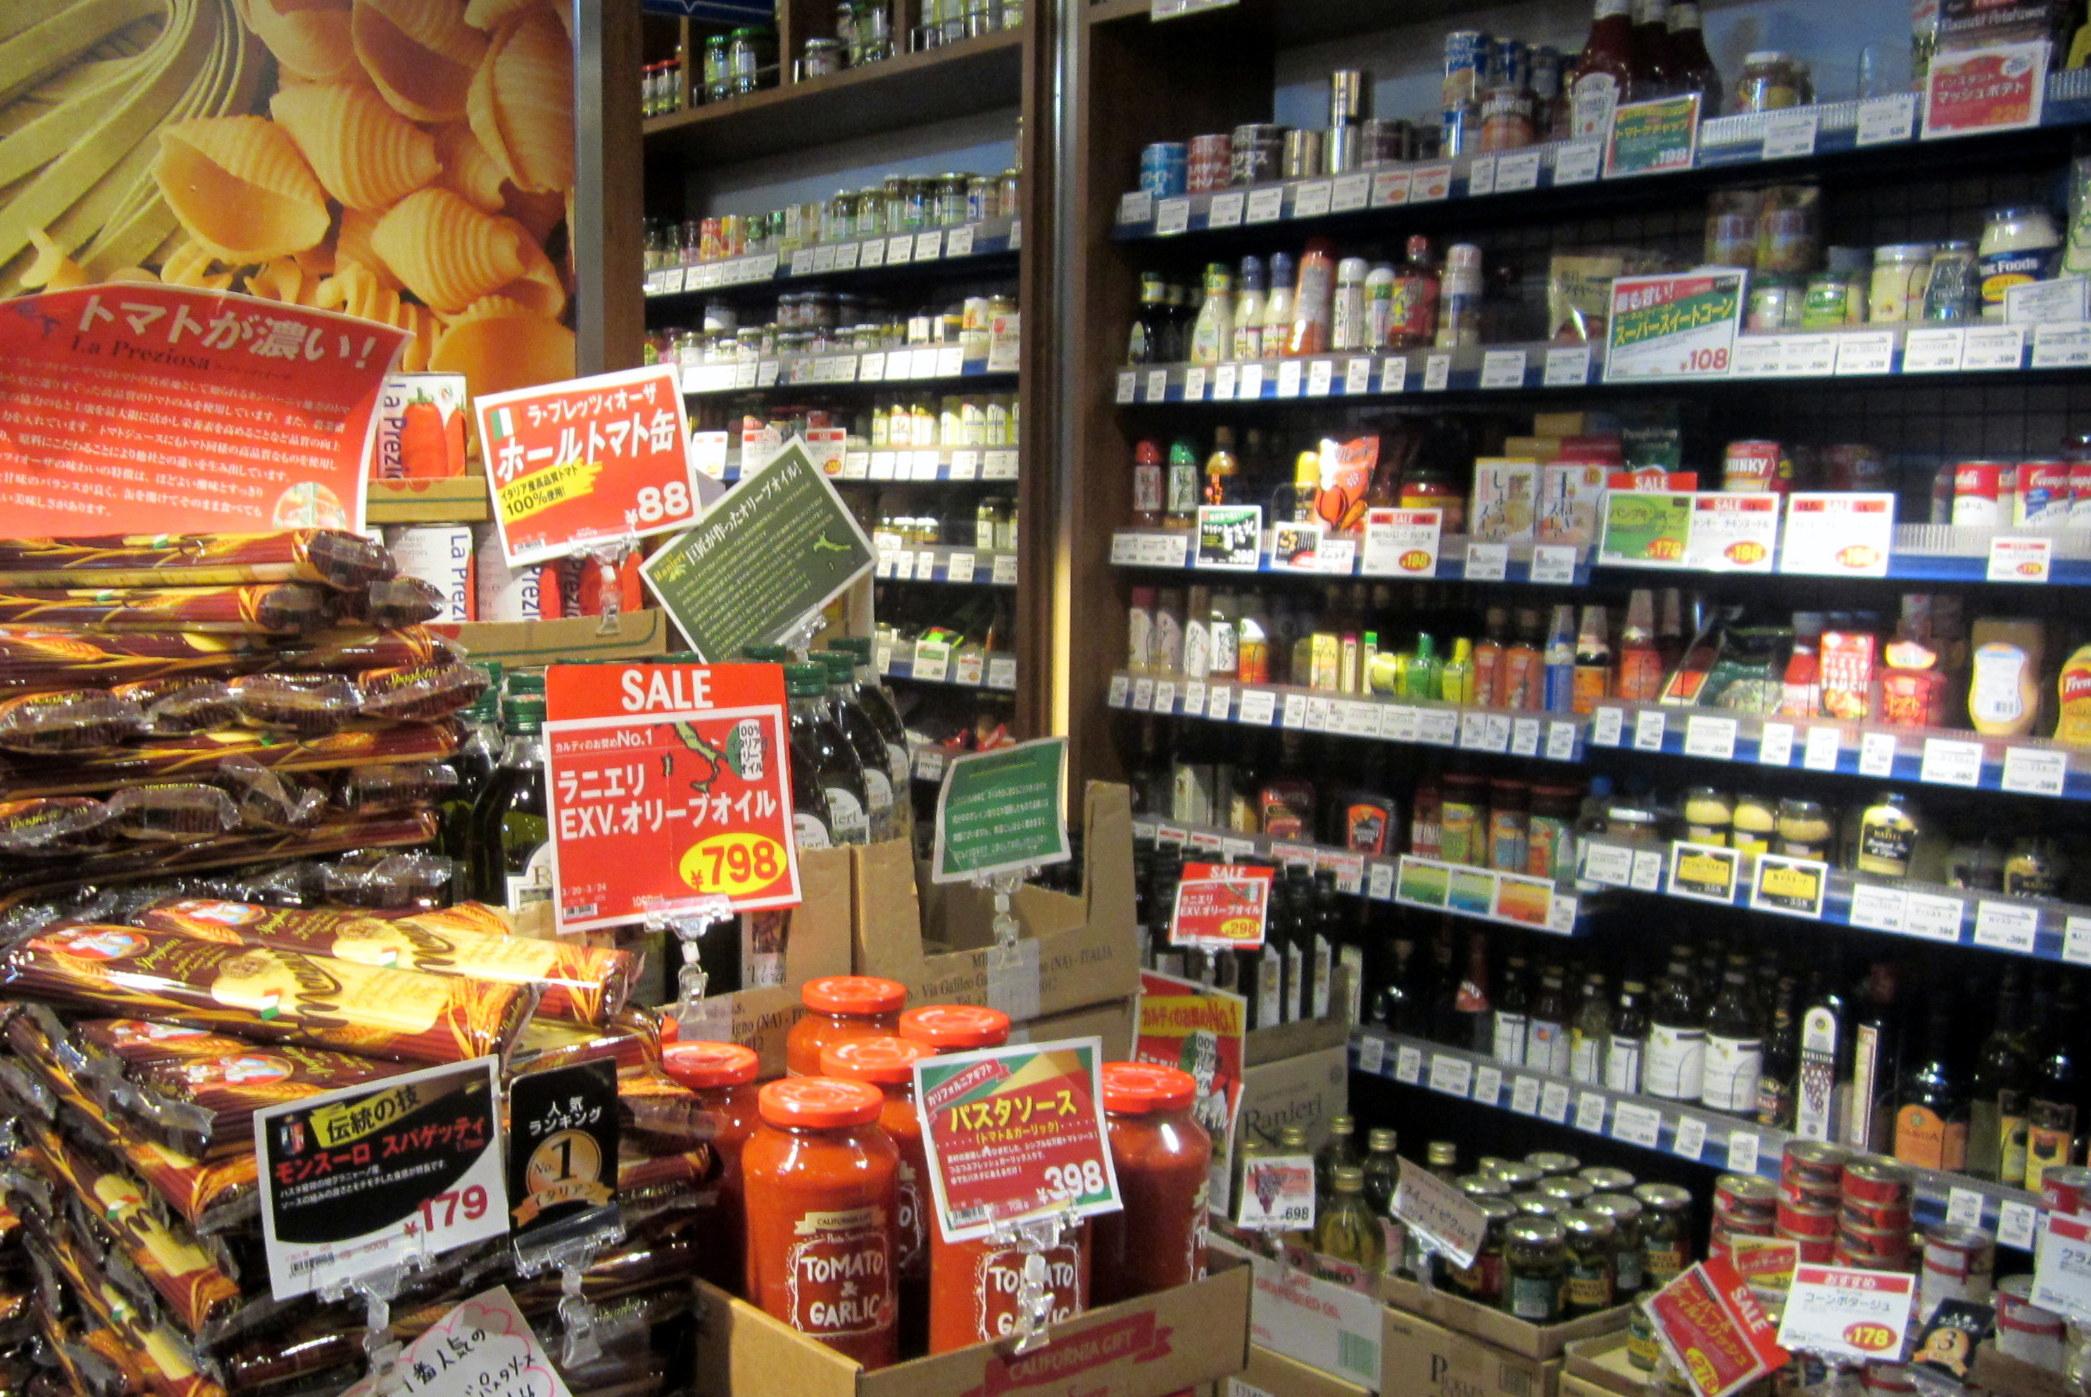 Kaldi Coffee Farm: Finally, an Affordable Import Store!